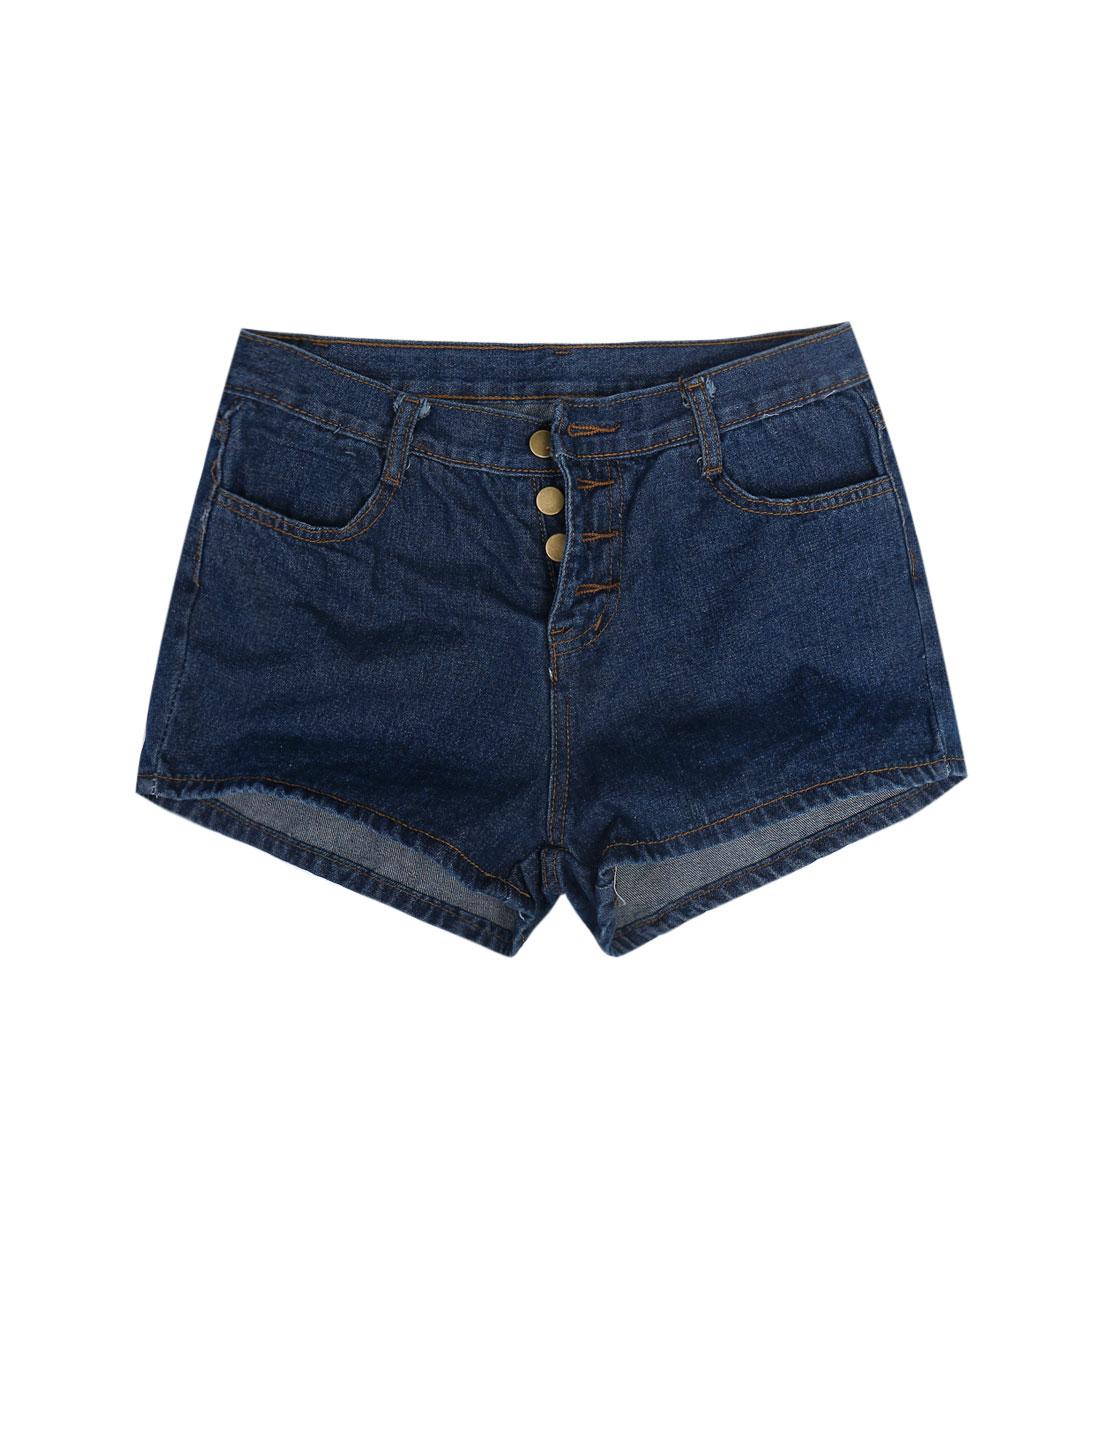 Lady Casual Belt Loop Button Closure High Rise Denim Shorts Dark Blue M